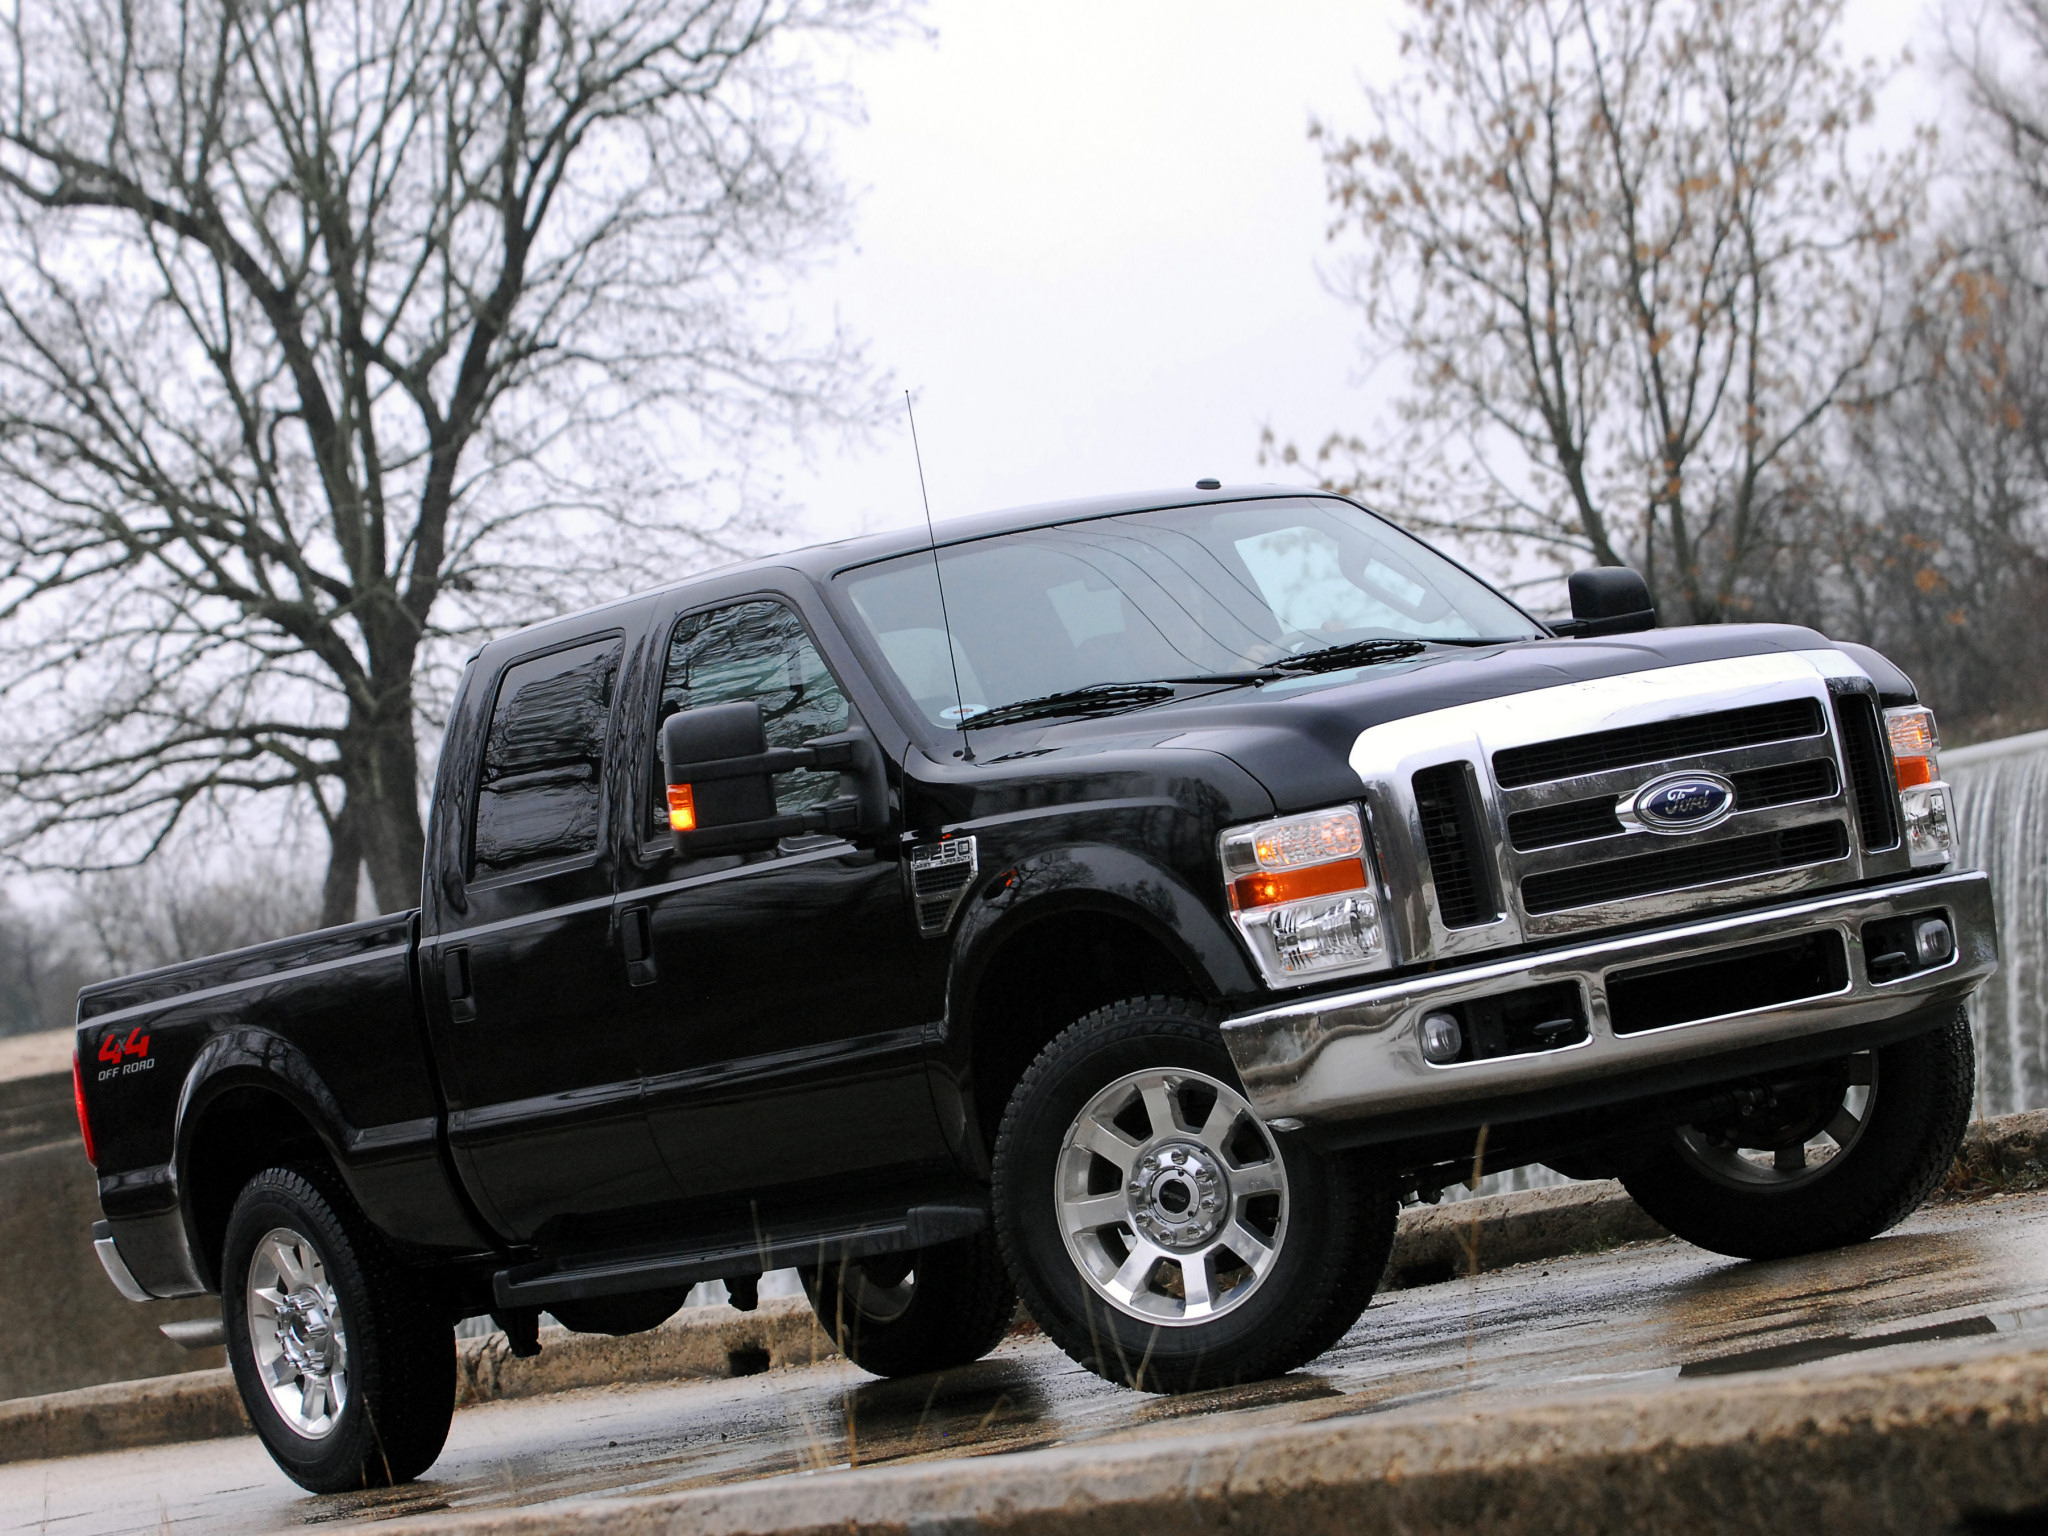 2008 Ford F 250 SuperDuty truck 4x4 f wallpaper background 2048x1536